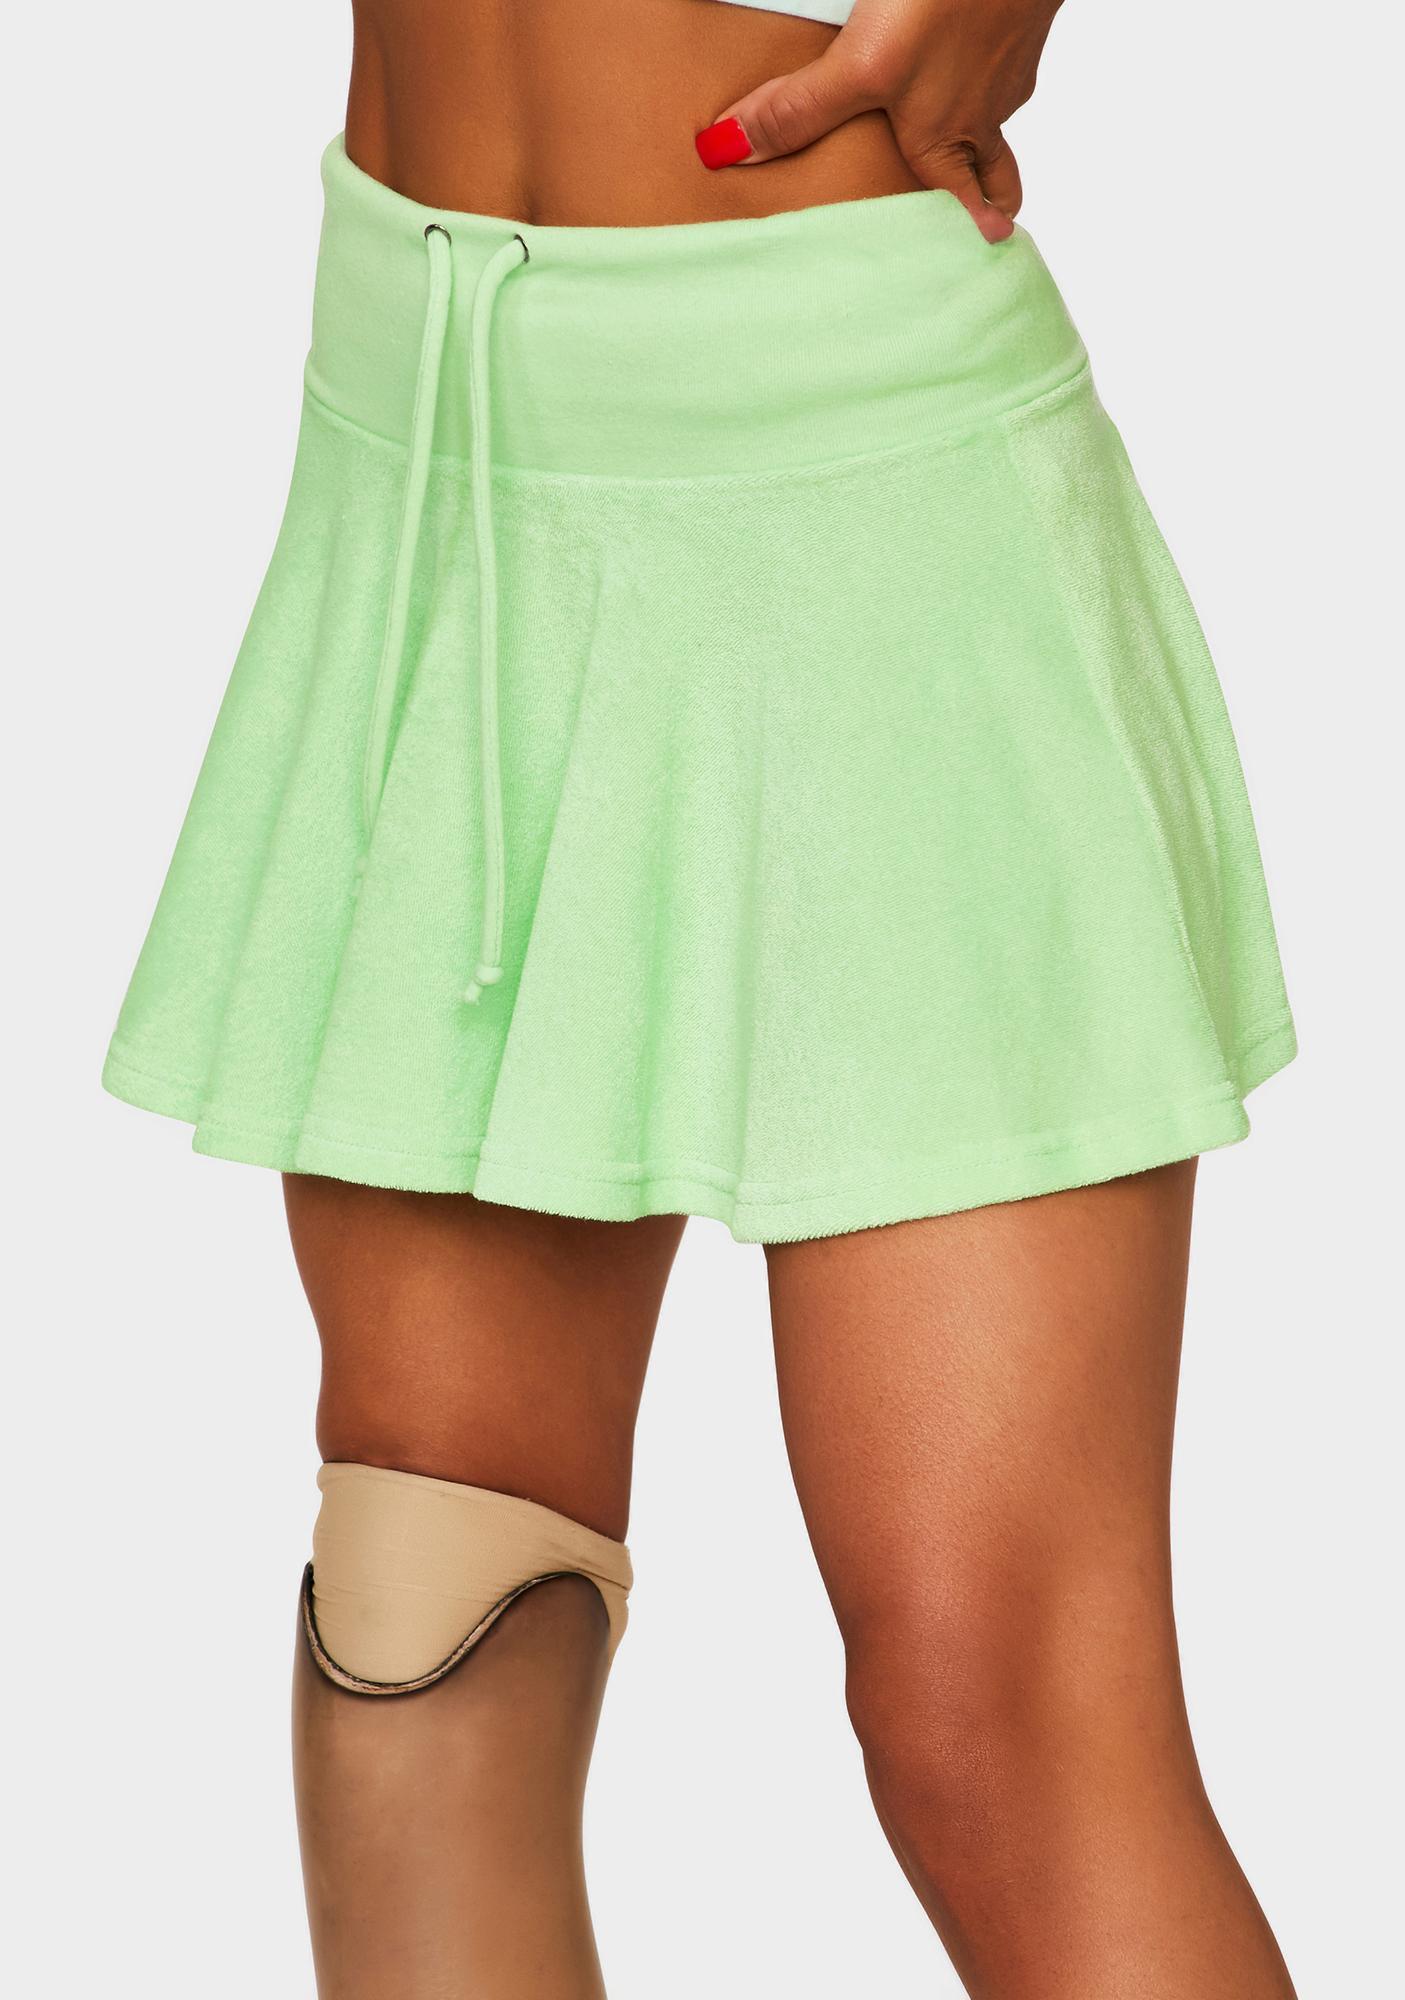 Kiwi Island Getaway Mini Skirt